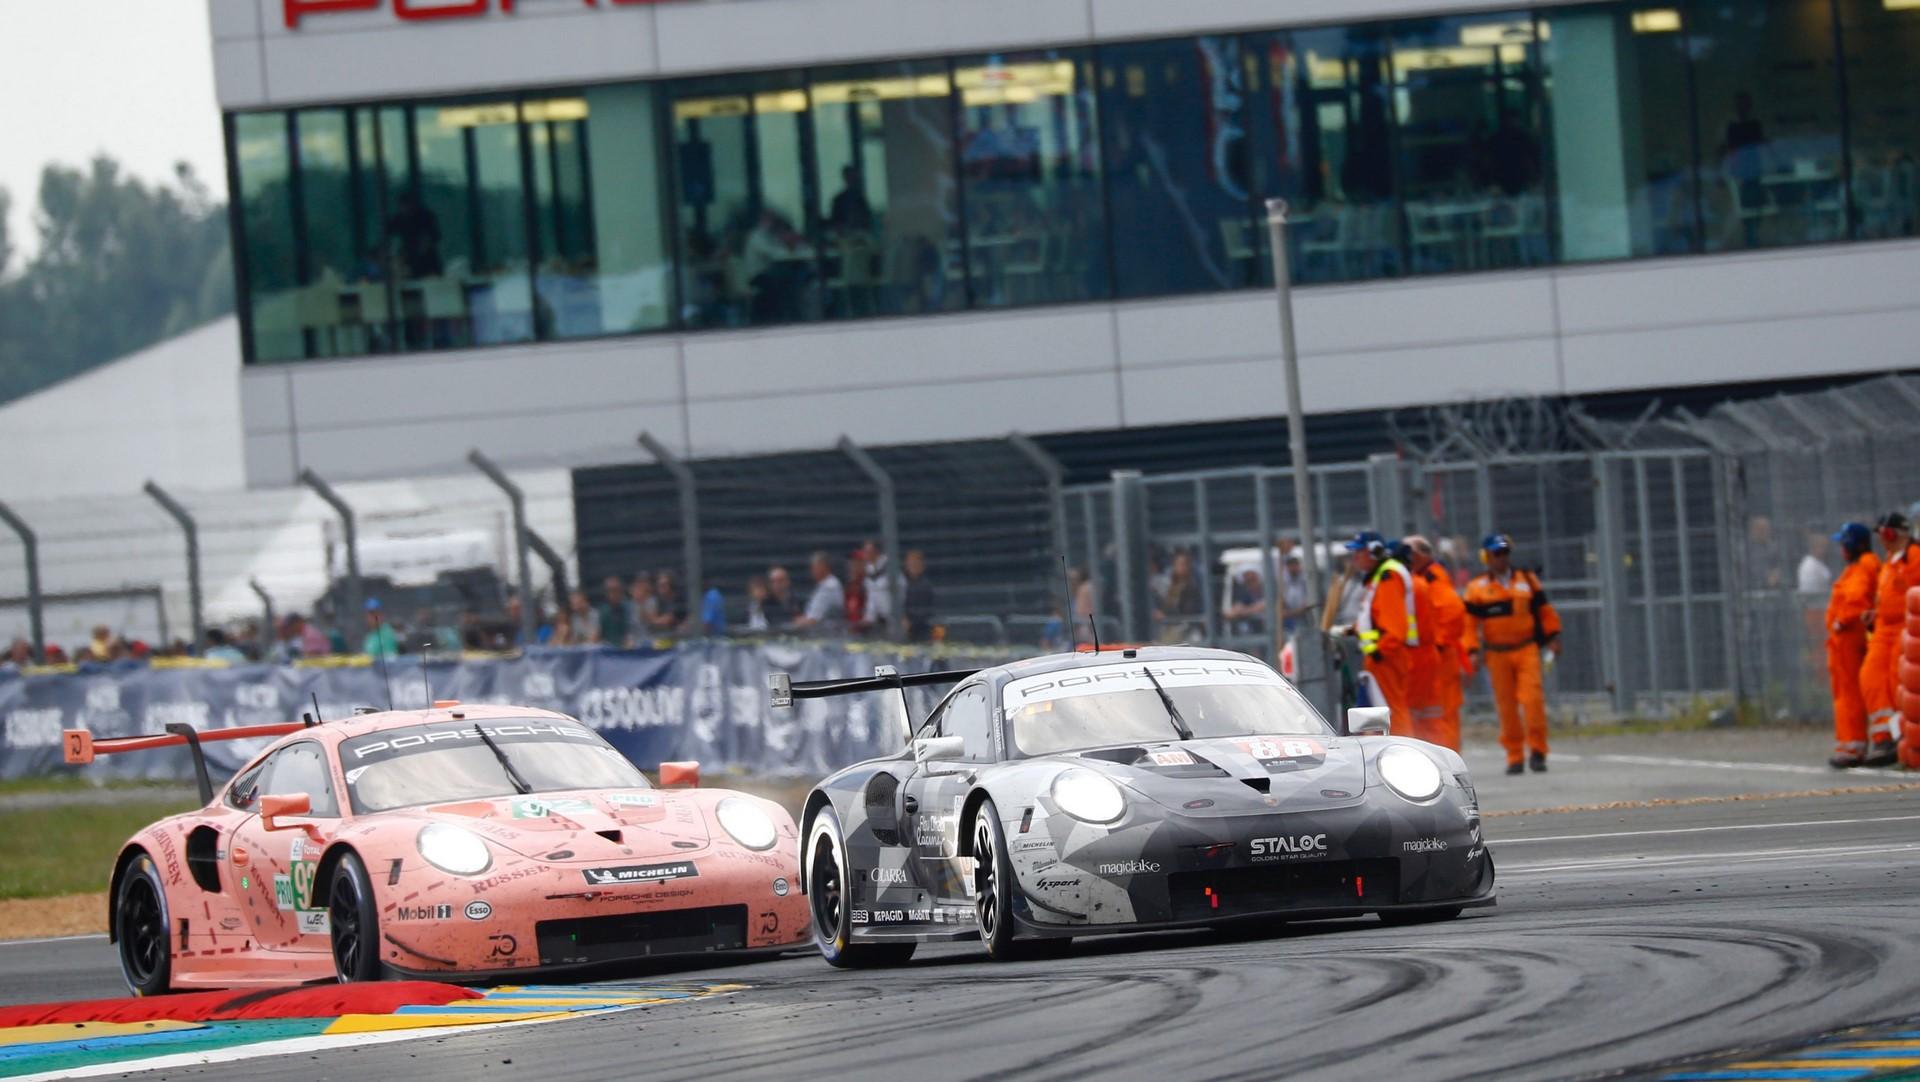 Porsche 911 RSR, Dempsey Proton Racing (88), Matteo Cairoli (I), Khaled Al Qubaisi (UAE), Giorgio Roda (I), Porsche GT Team (92), Michael Christensen (DK), Kevin Estre (F) Laurens Vanthoor (B), Le Mans 2018